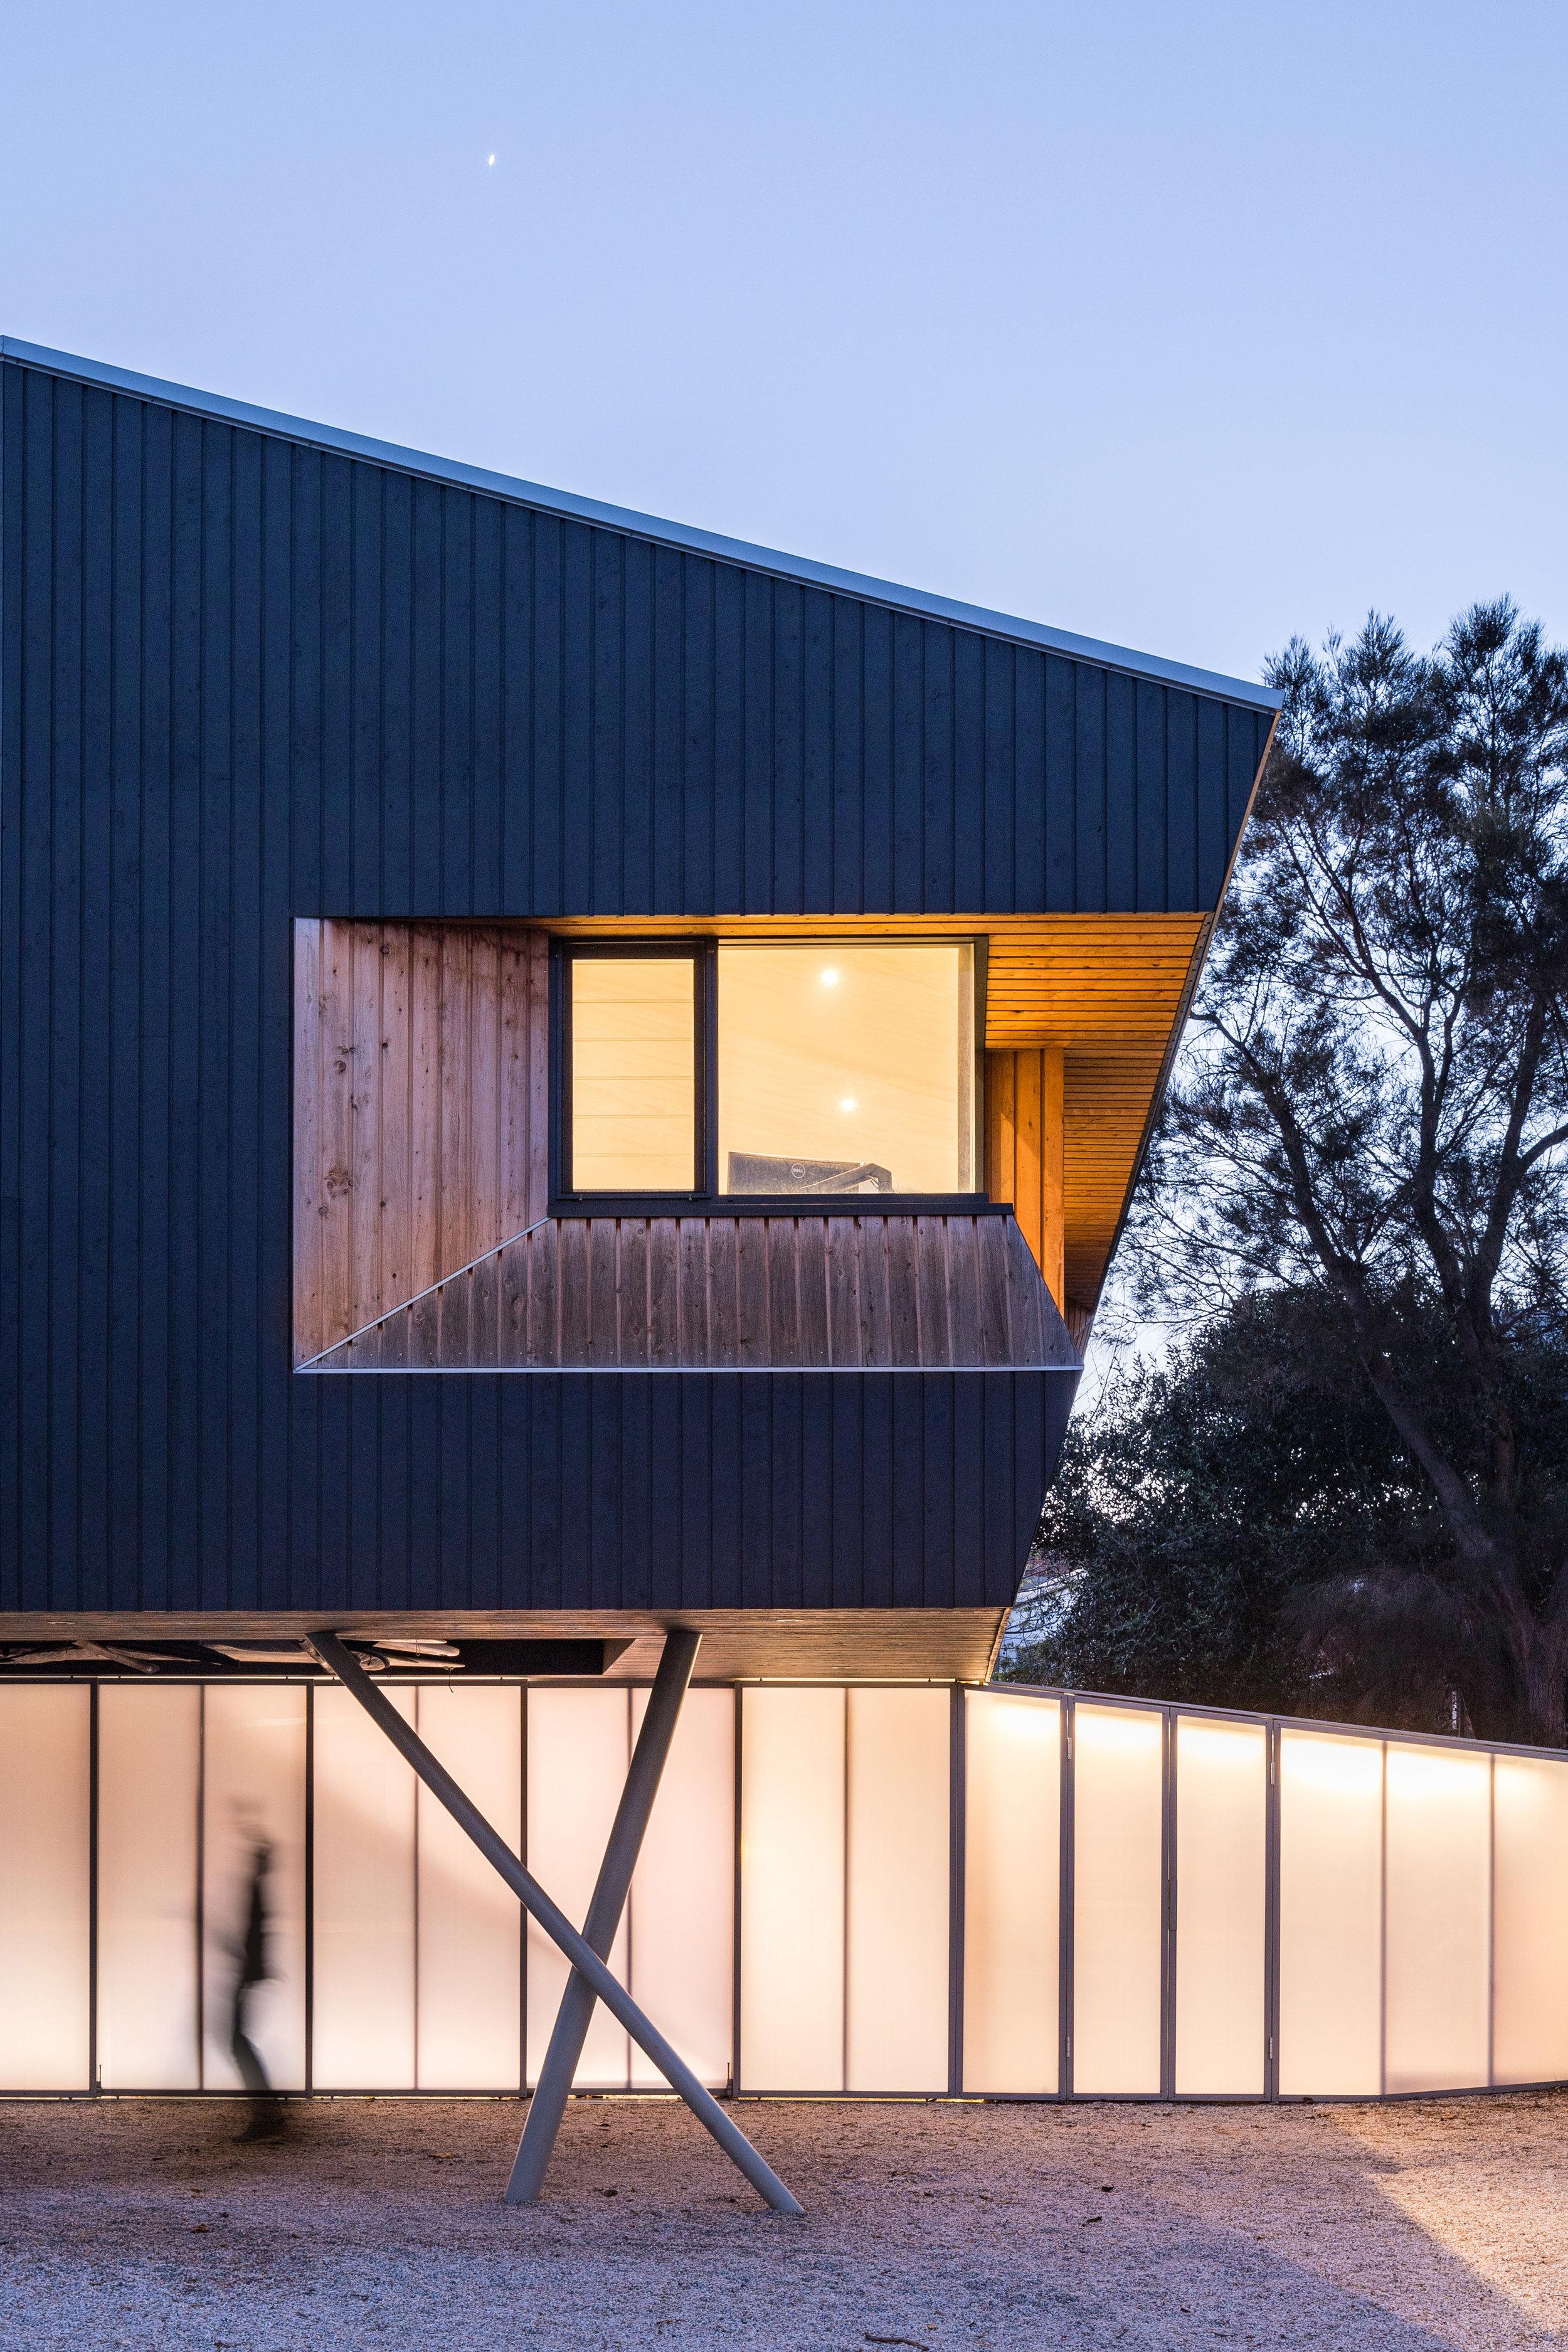 3476-small_Beach Office_Braham Architects_Nicholas Putrasia_00.jpg